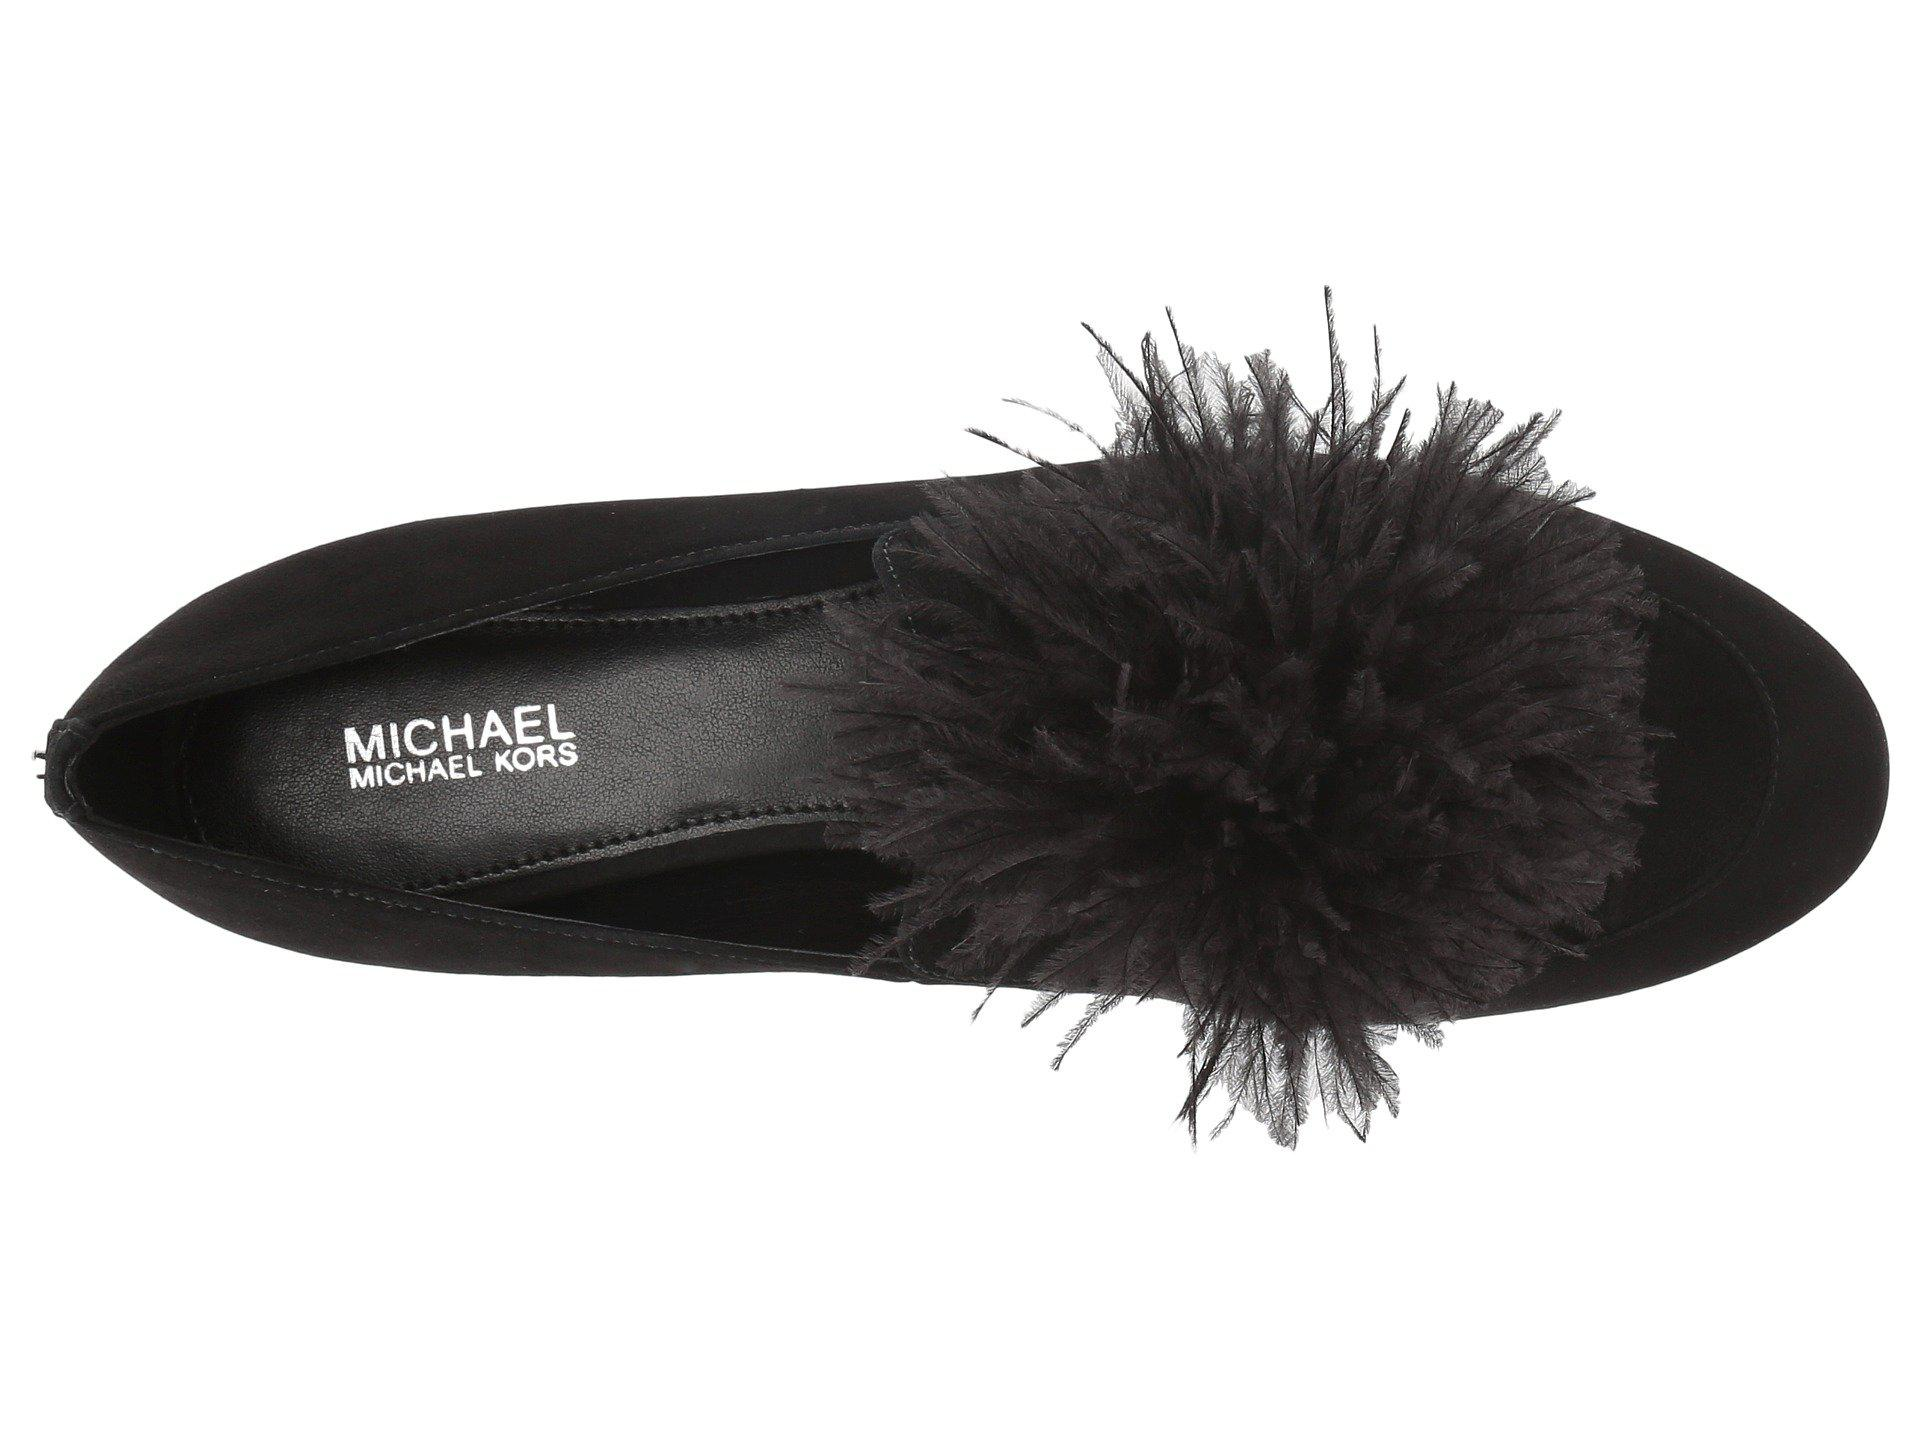 36d5f22b2fe Lyst - MICHAEL Michael Kors Fara Loafer in Black